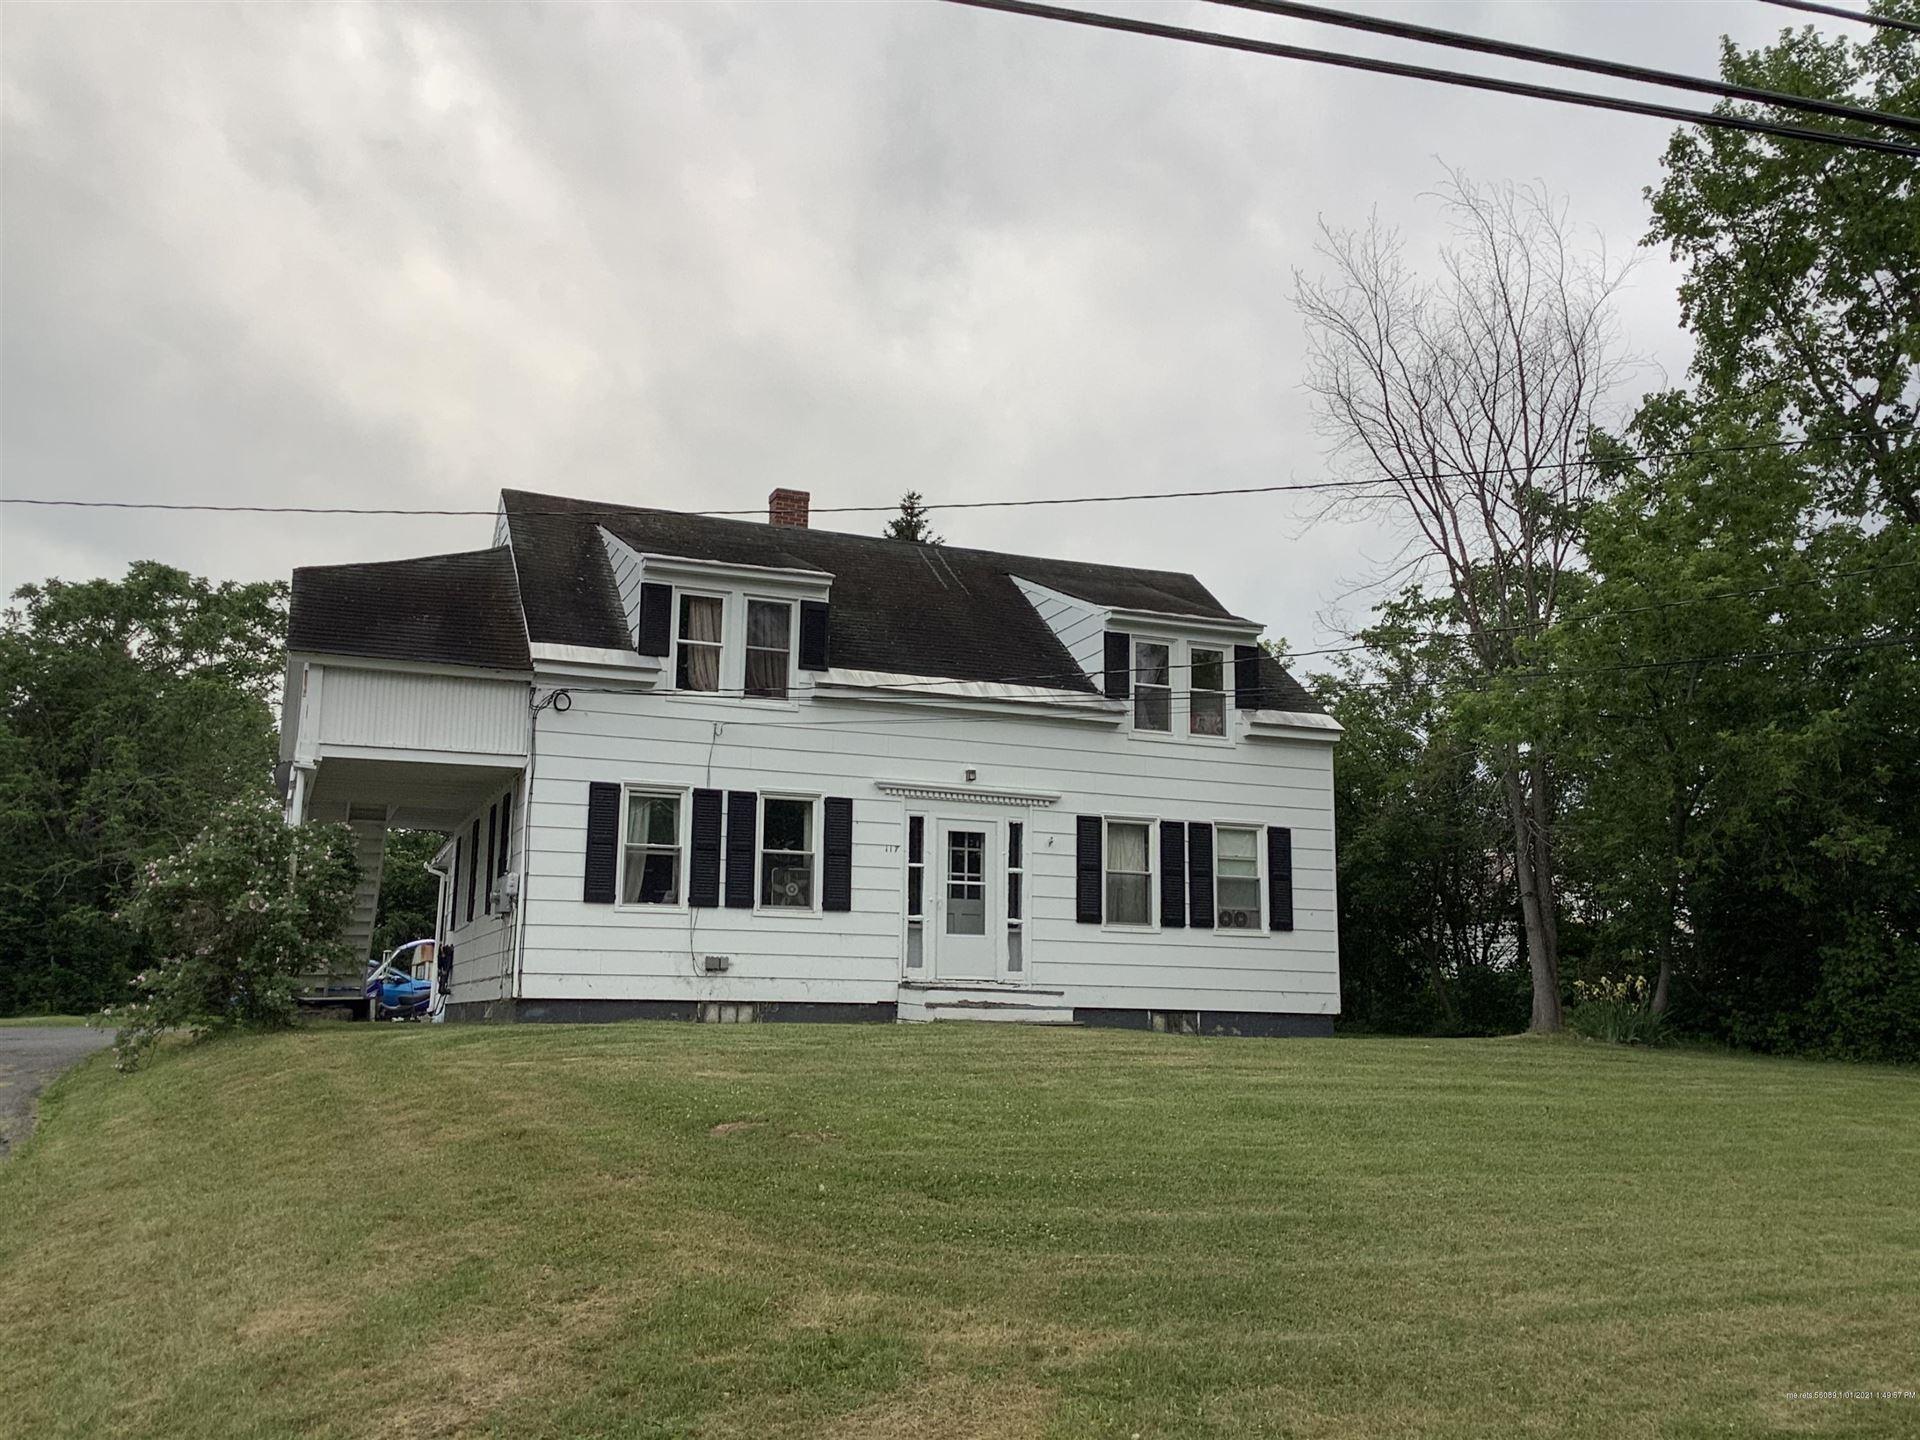 Photo of 117 Main Street, Fort Fairfield, ME 04742 (MLS # 1478956)